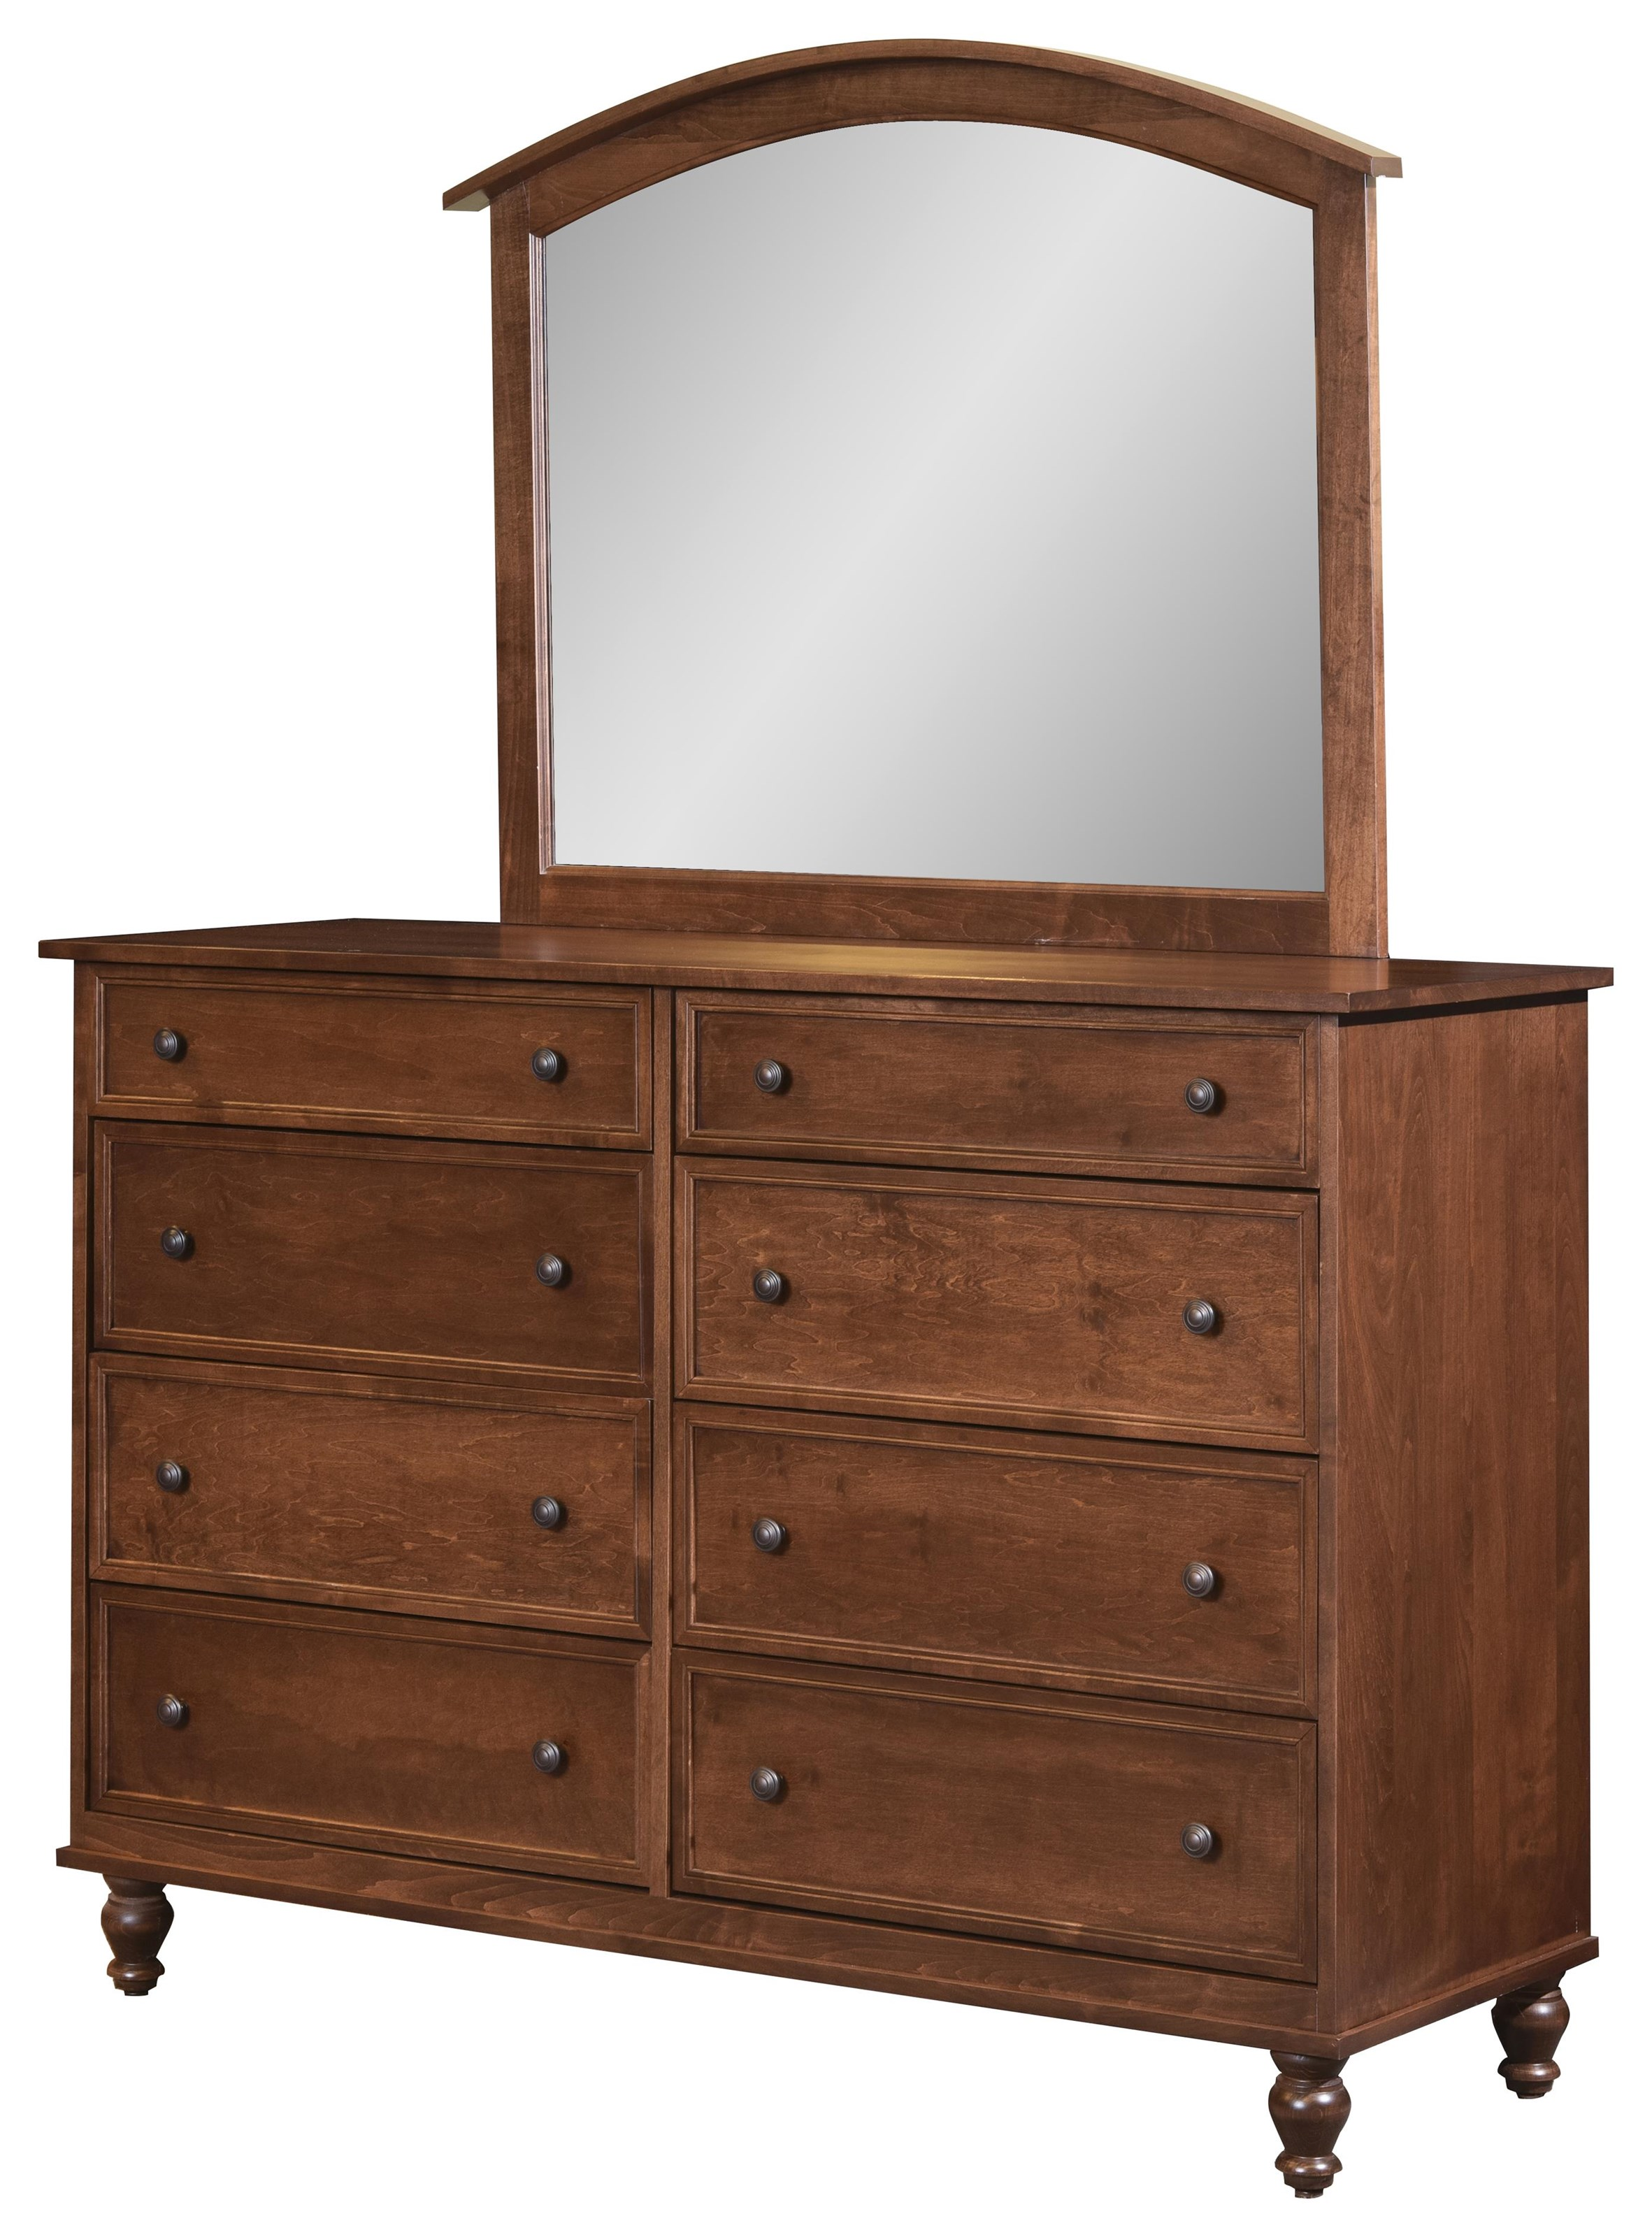 Wayside Custom Furniture Newport 8 Drawer Mule Dresser & Mirror - Item Number: 1029X-10166X